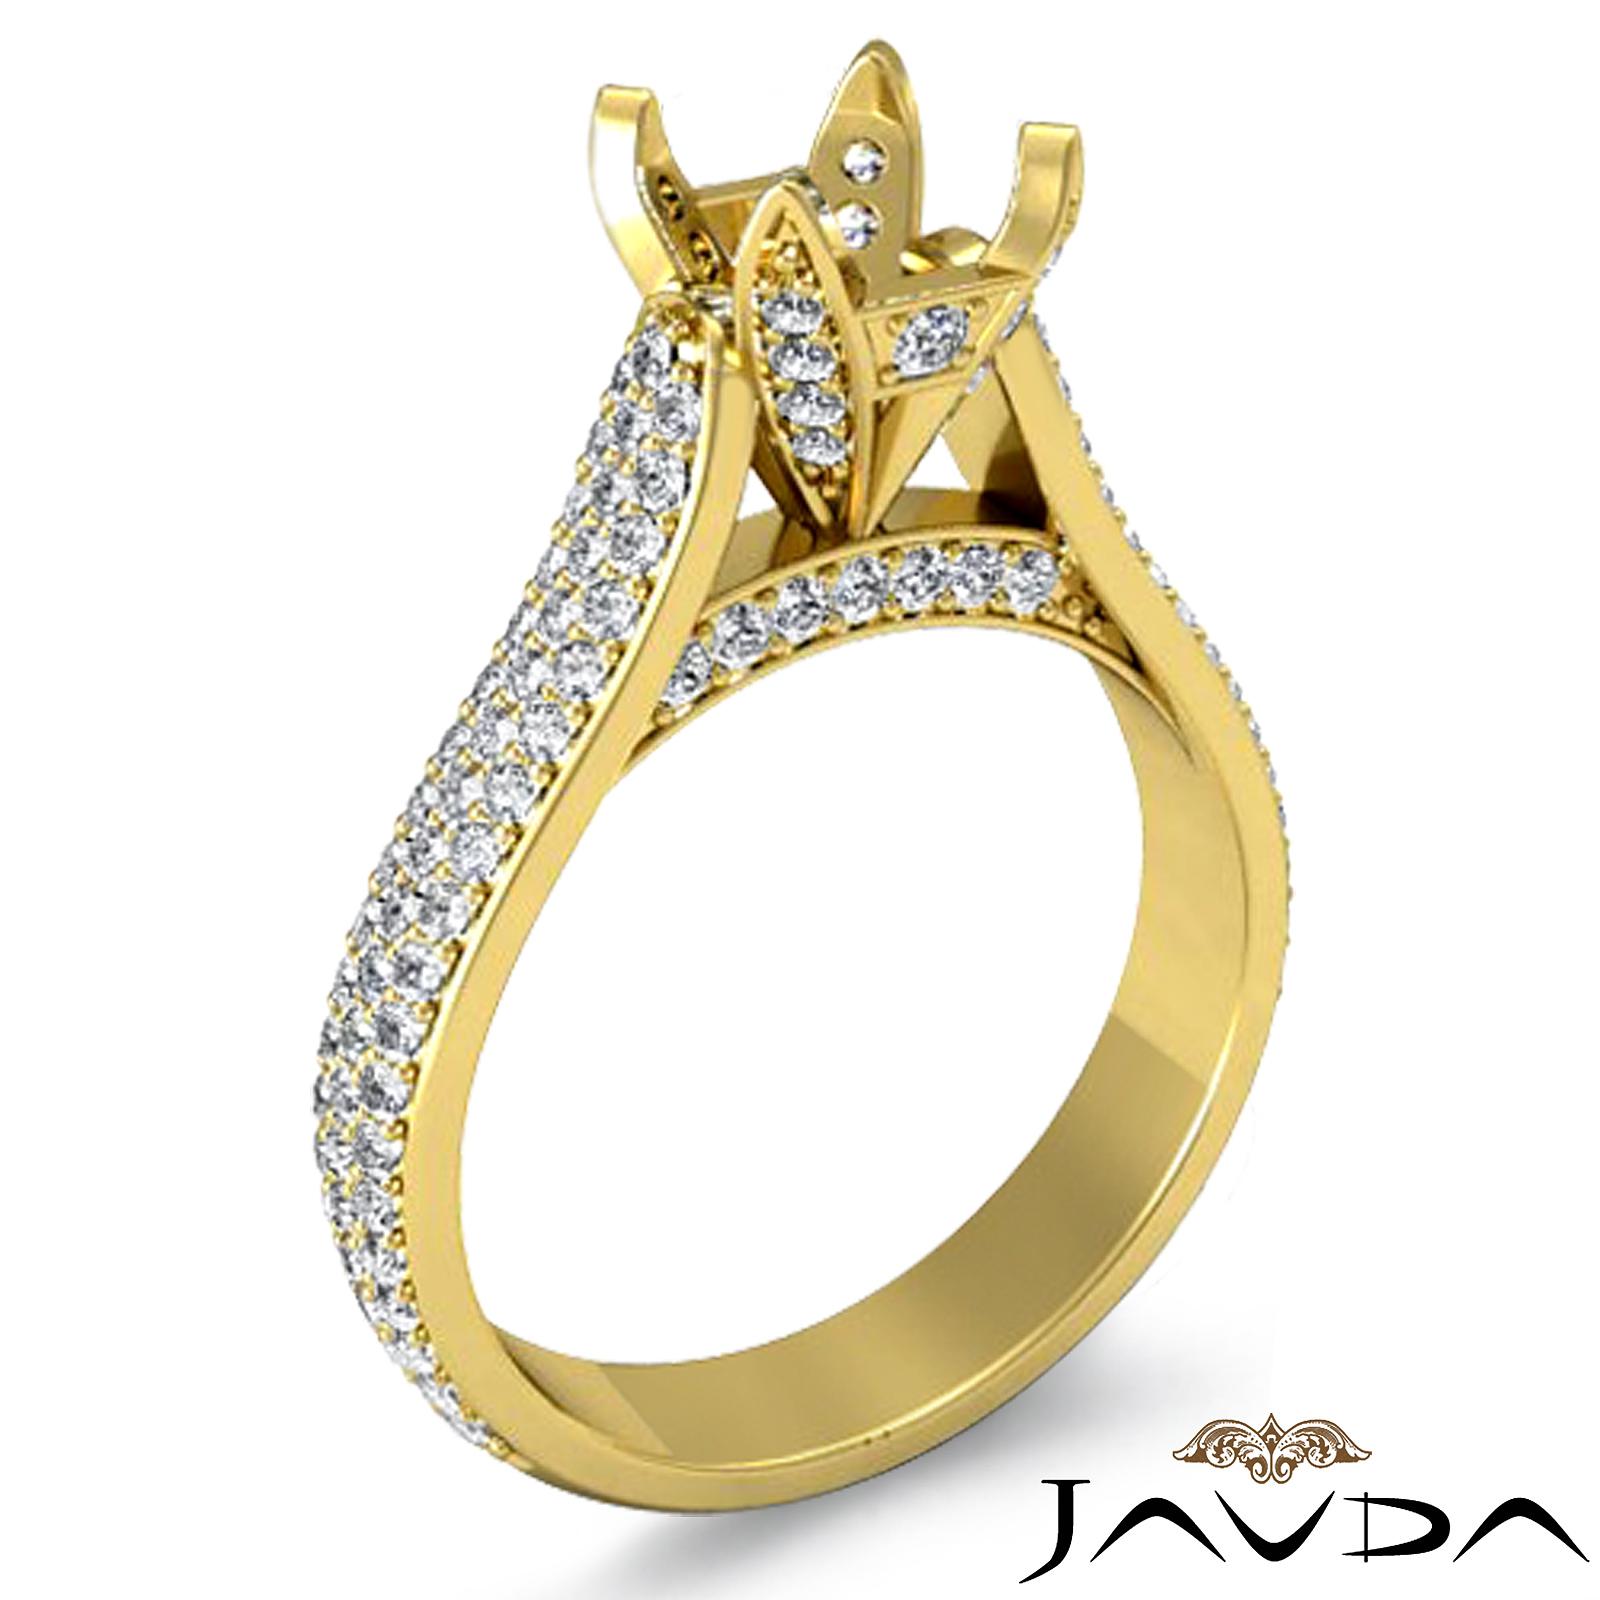 Halo Pave Setting Diamond Engagement Round Semi Mount Ring 18k Gold Yellow 1